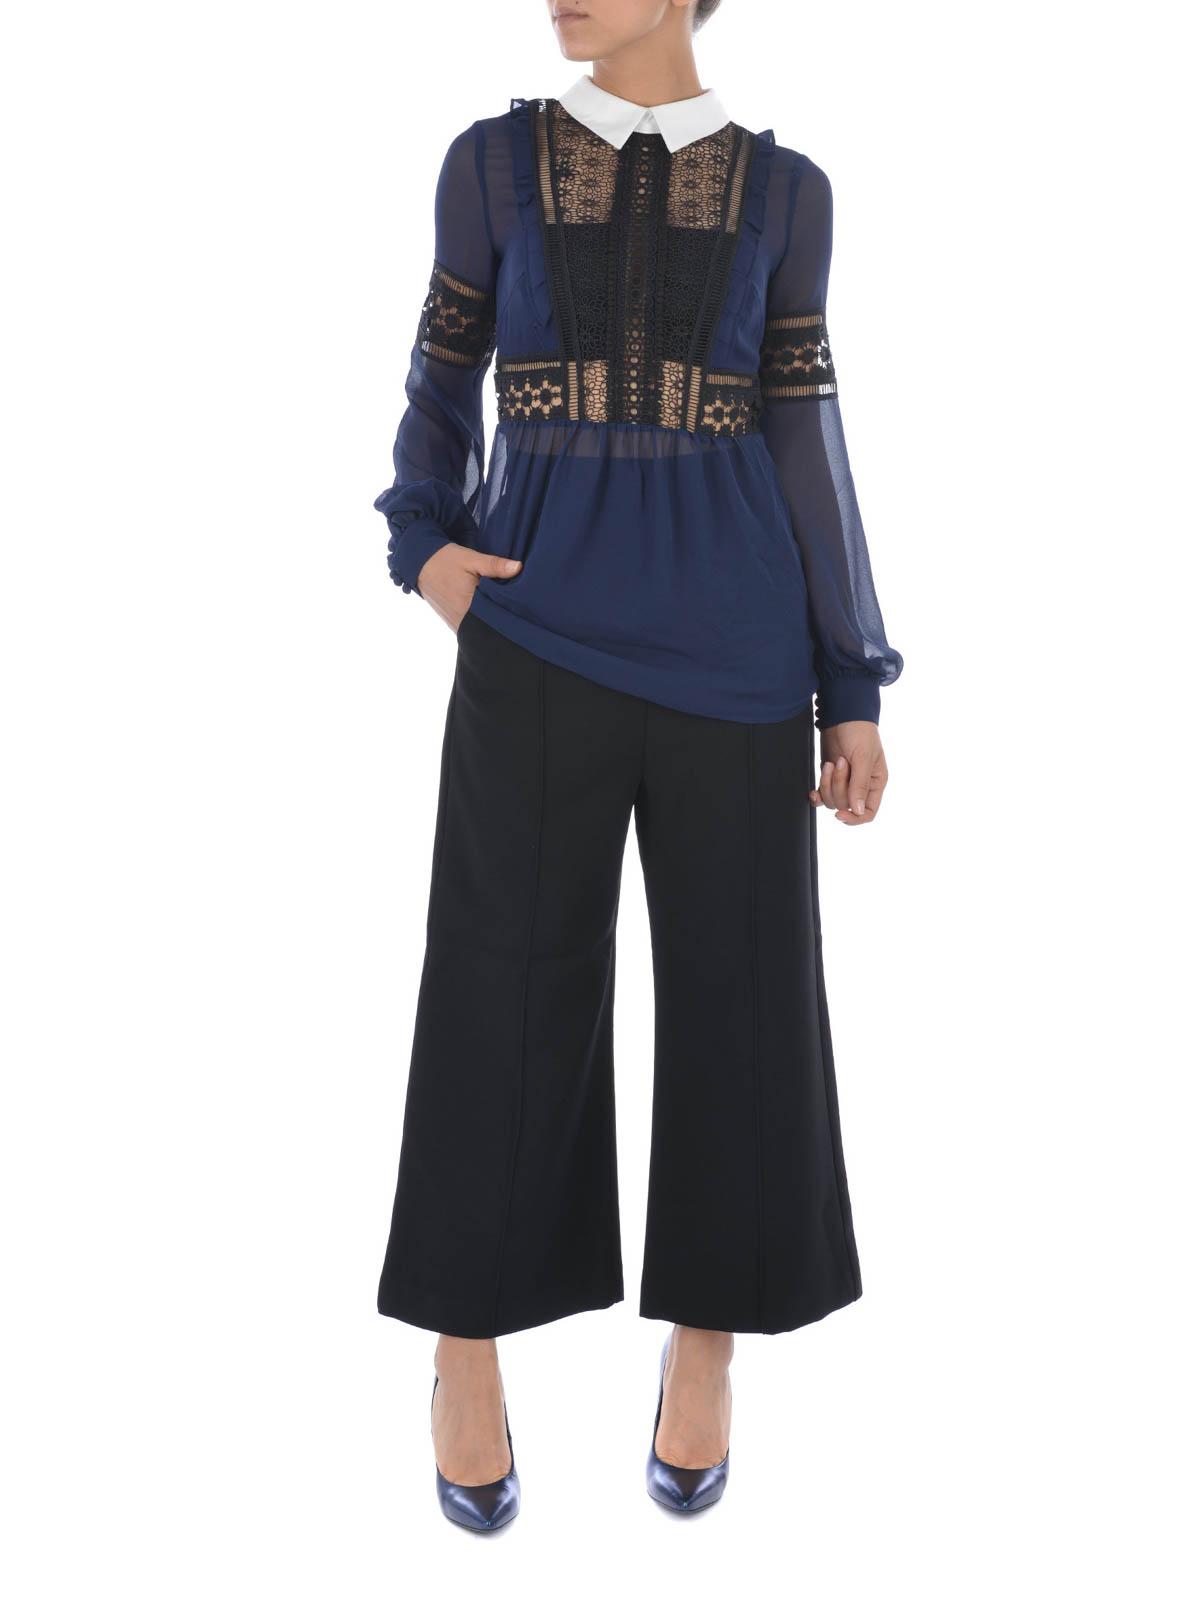 self portrait culotte in crepe con zip dietro pantaloni casual sp10 095. Black Bedroom Furniture Sets. Home Design Ideas